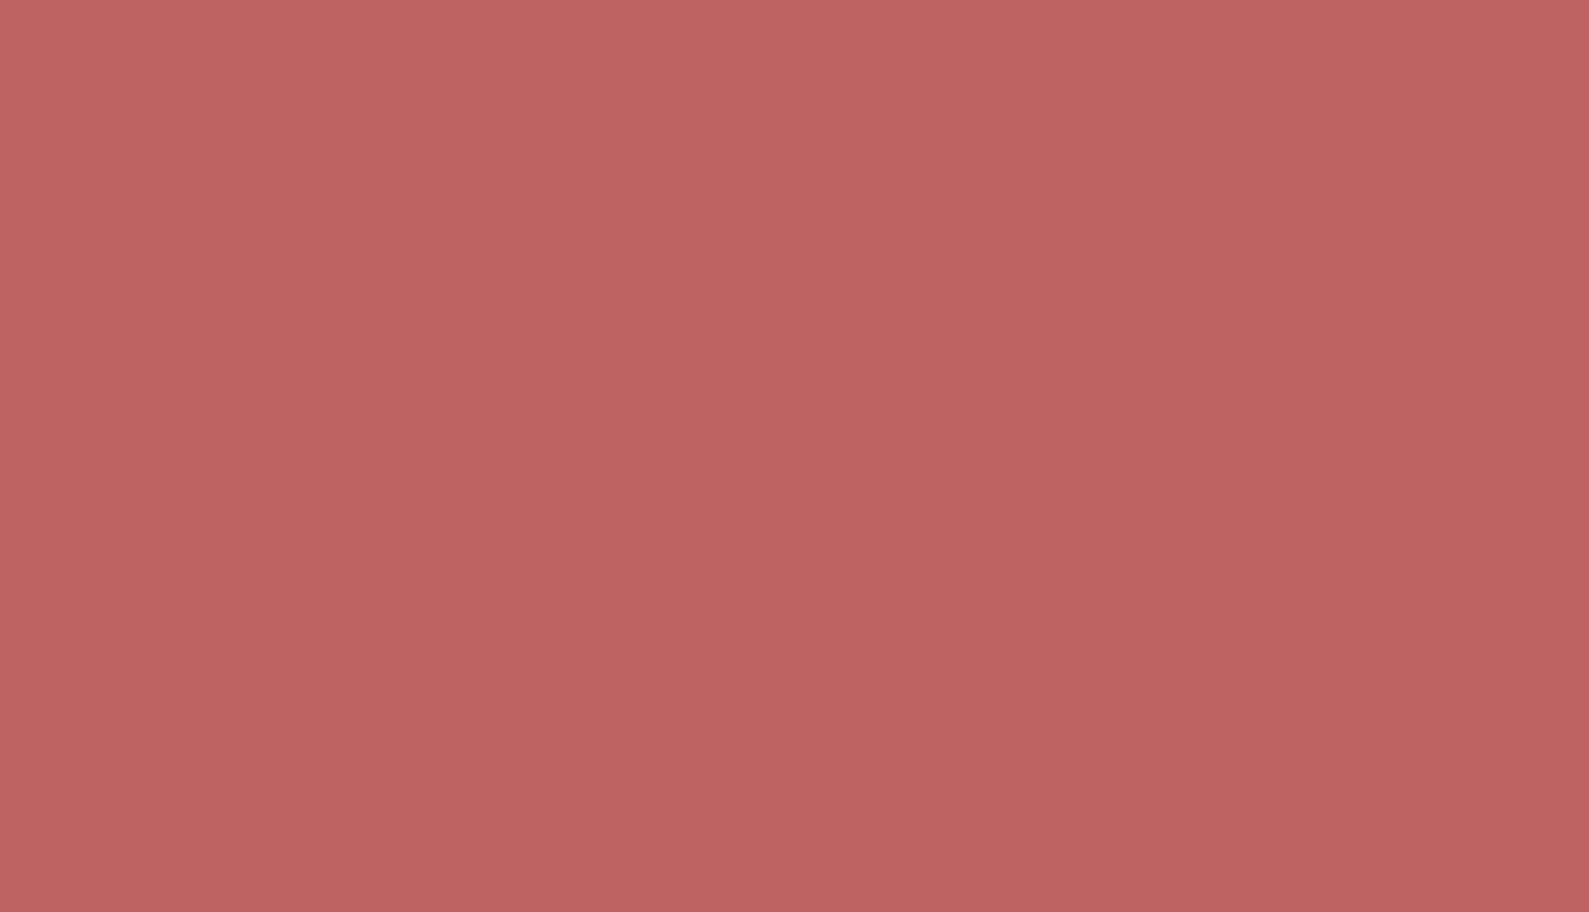 rectangle burgundy Clipart illustration in PNG, SVG